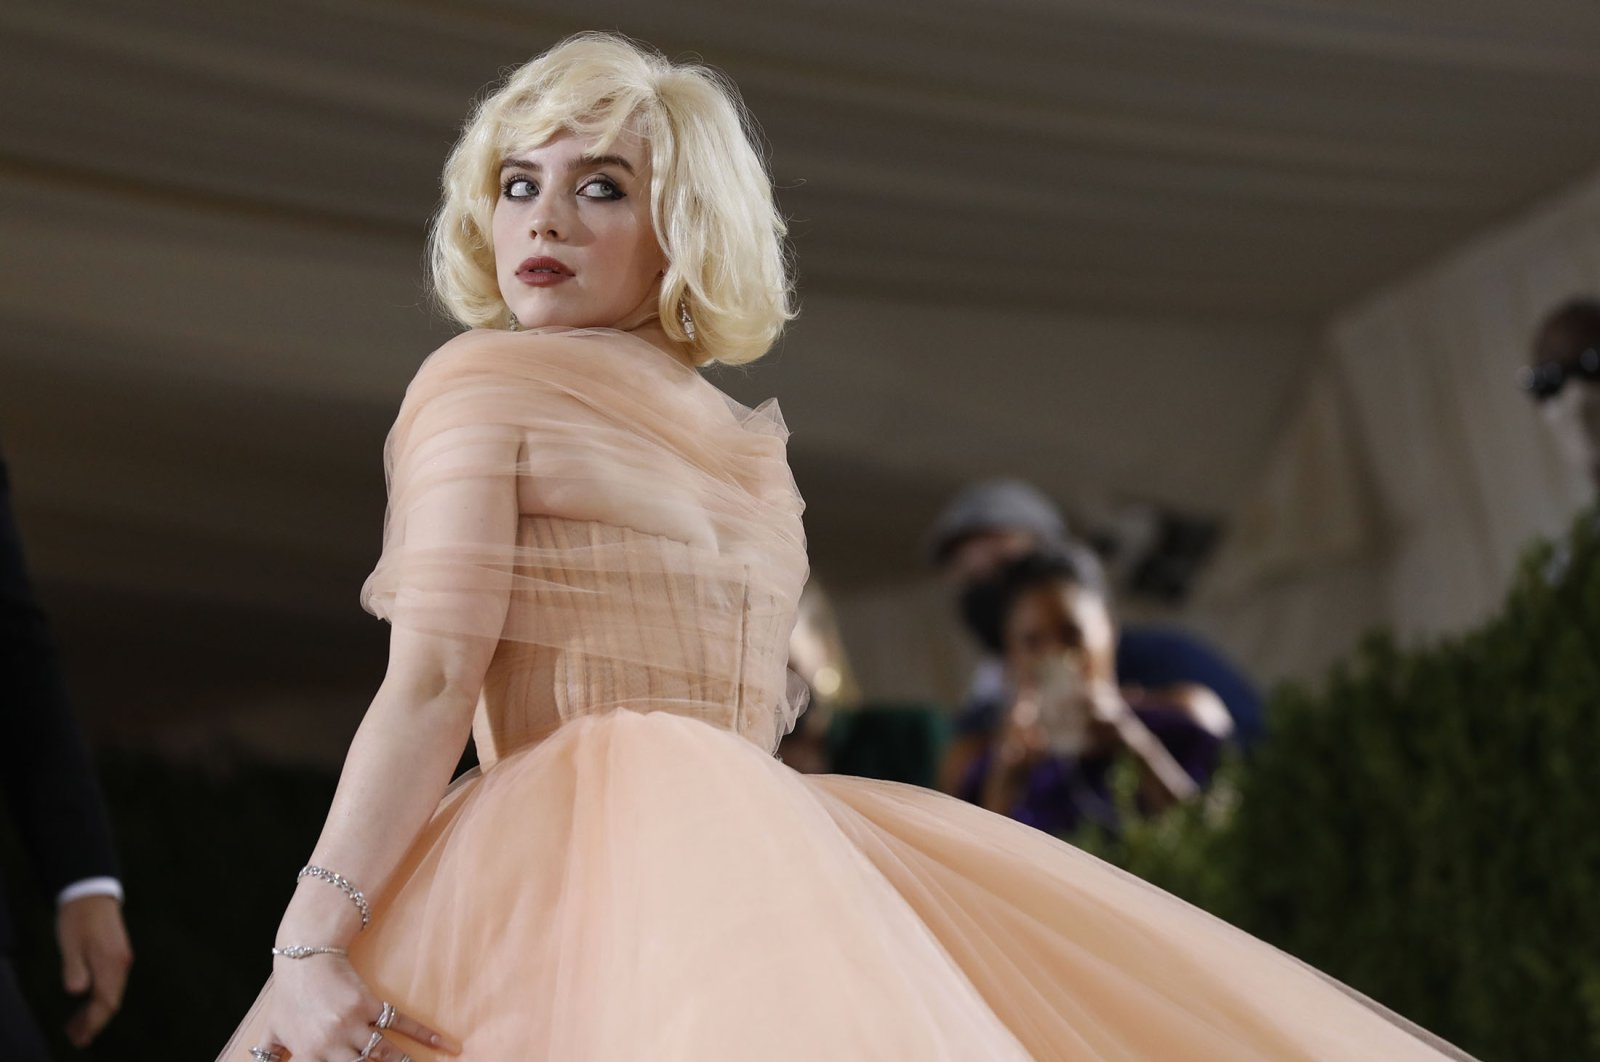 Billie Eilisharrives for the 2021 Met Gala at the Metropolitan Museum of Art, in New York, U.S., Sept. 13, 2021. (Reuters Photo)